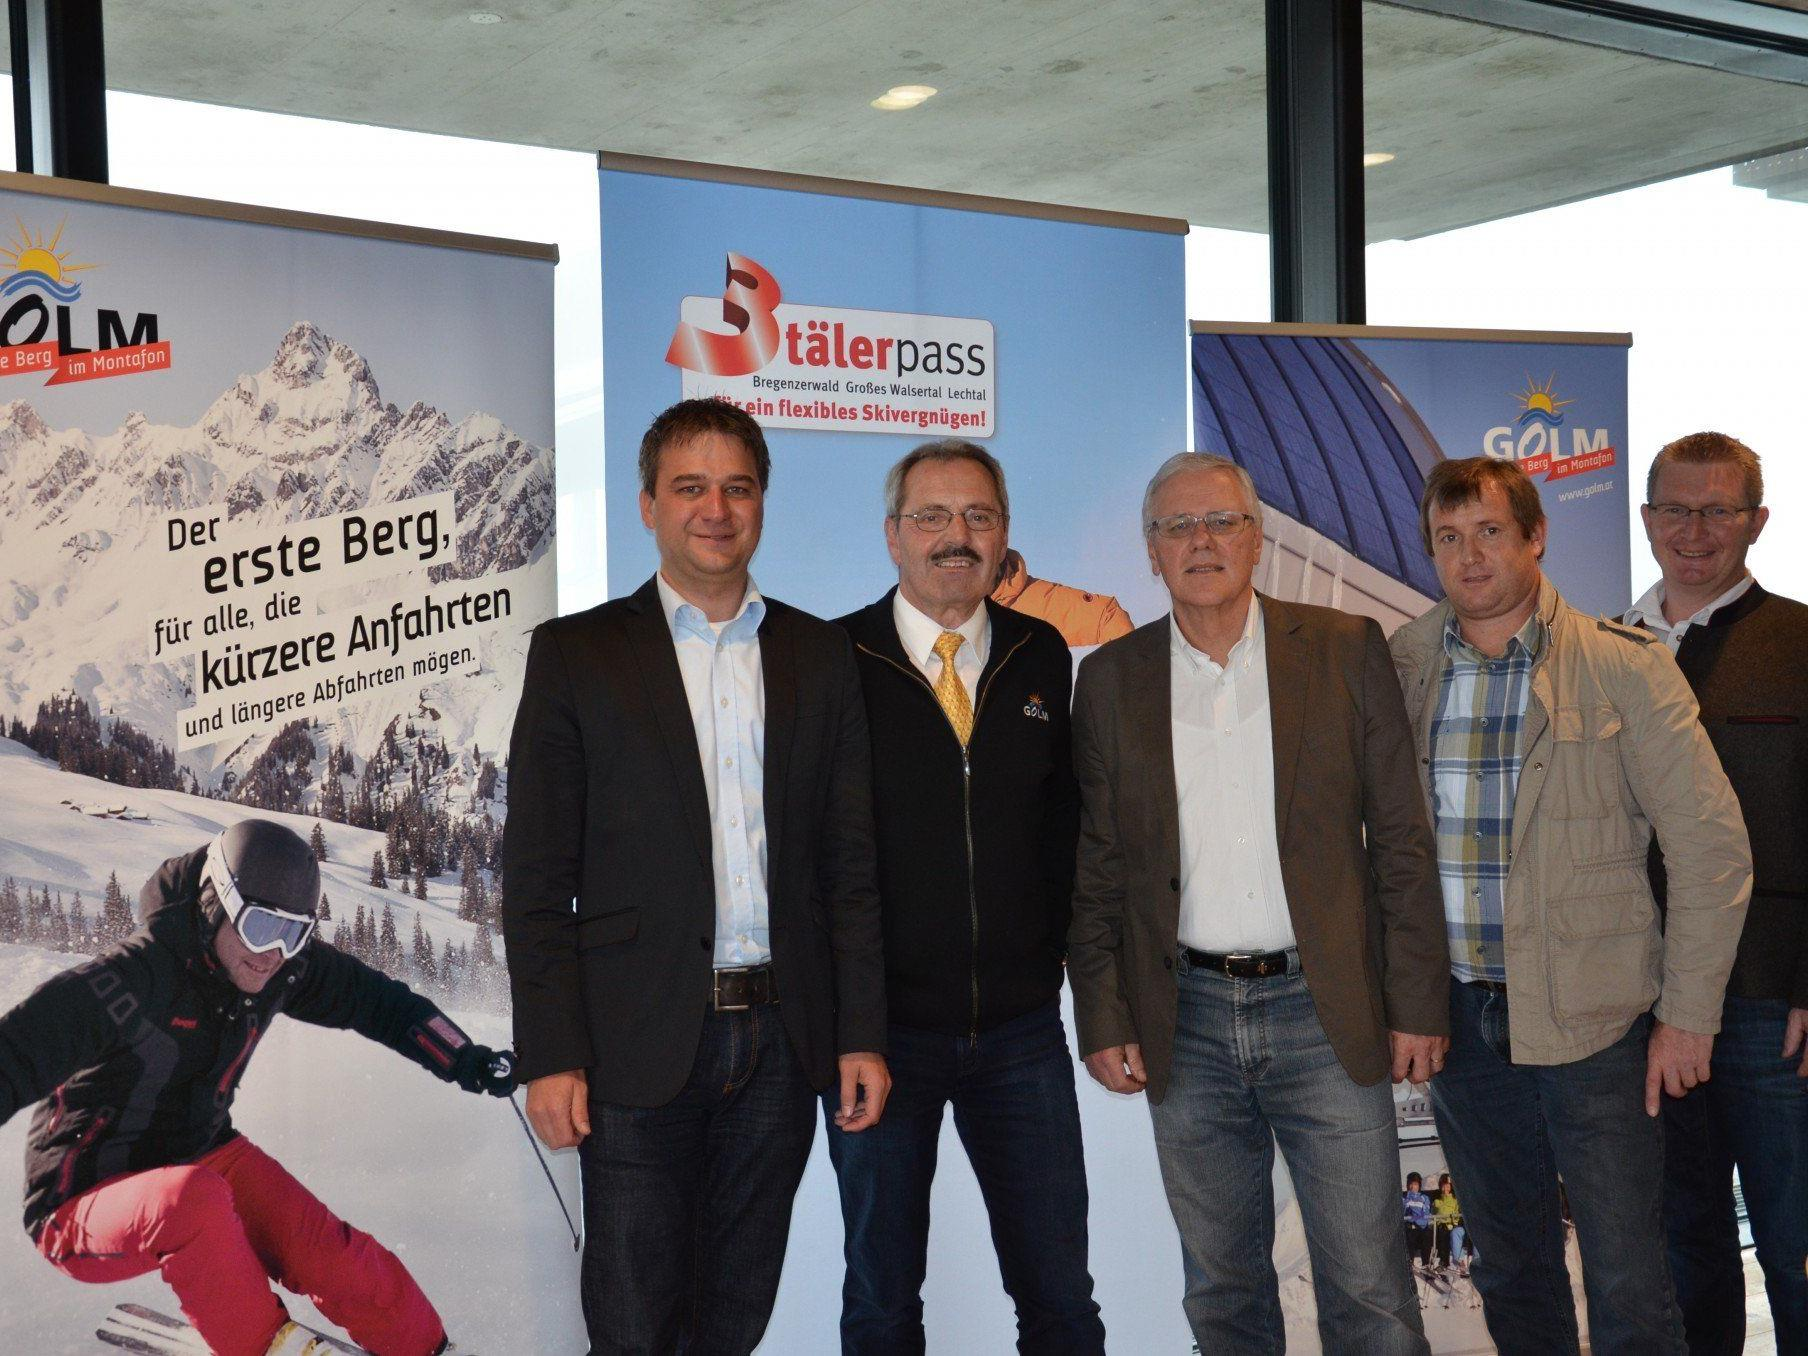 vl. Thomas Übelher (Obmann 3Täler Marketingausschuss), Werner Netzer (GF Illwerke Tourismus), Wolfgang Beck (GF 3Täler Touristik), Thomas Lerch (GF Bergbahnen Gargellen), Günter Oberhauser (Obmann 3Täler Beirat)